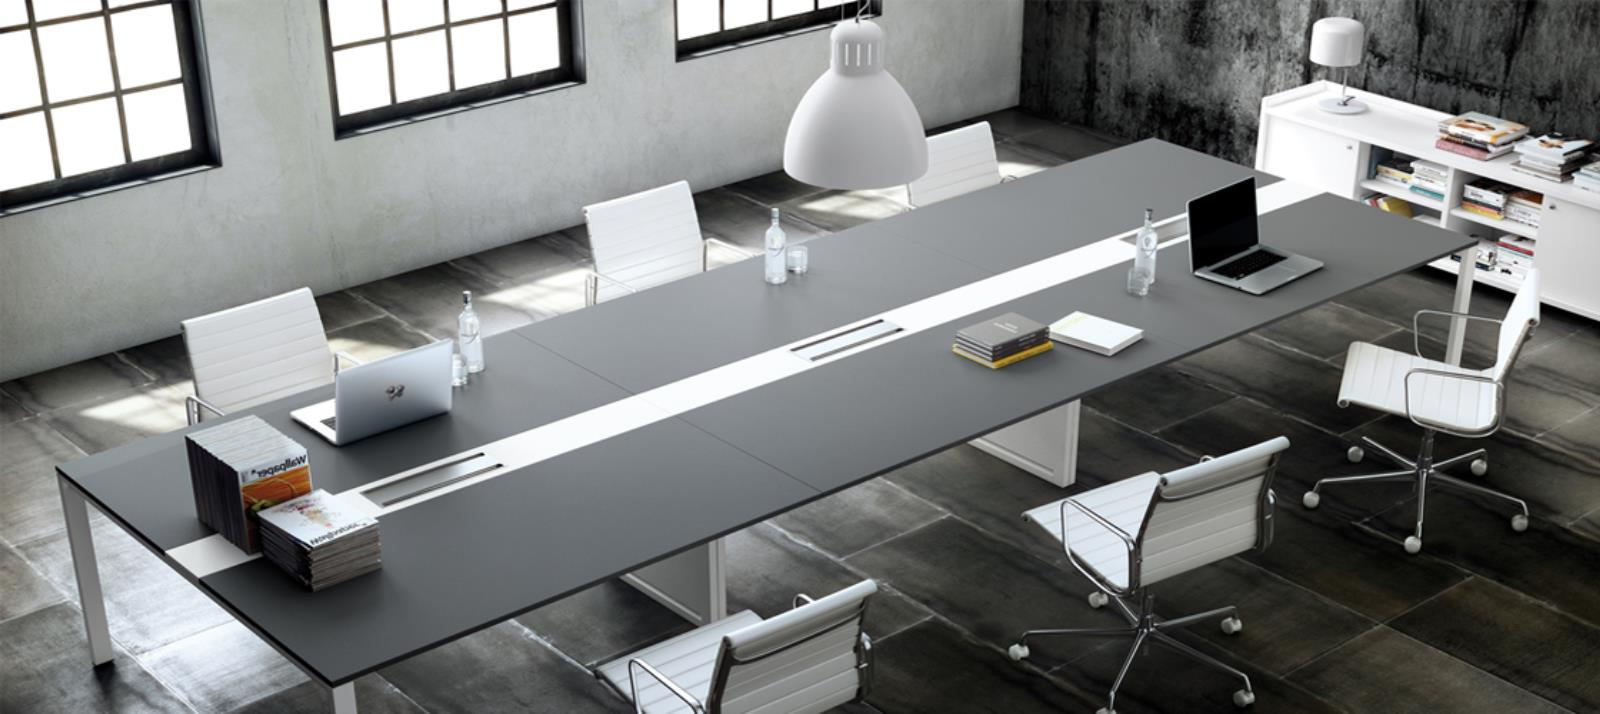 Mobiliario Oficina Zwdg Modus Design Muebles De Oficina Muebles Oficina Muebles Para